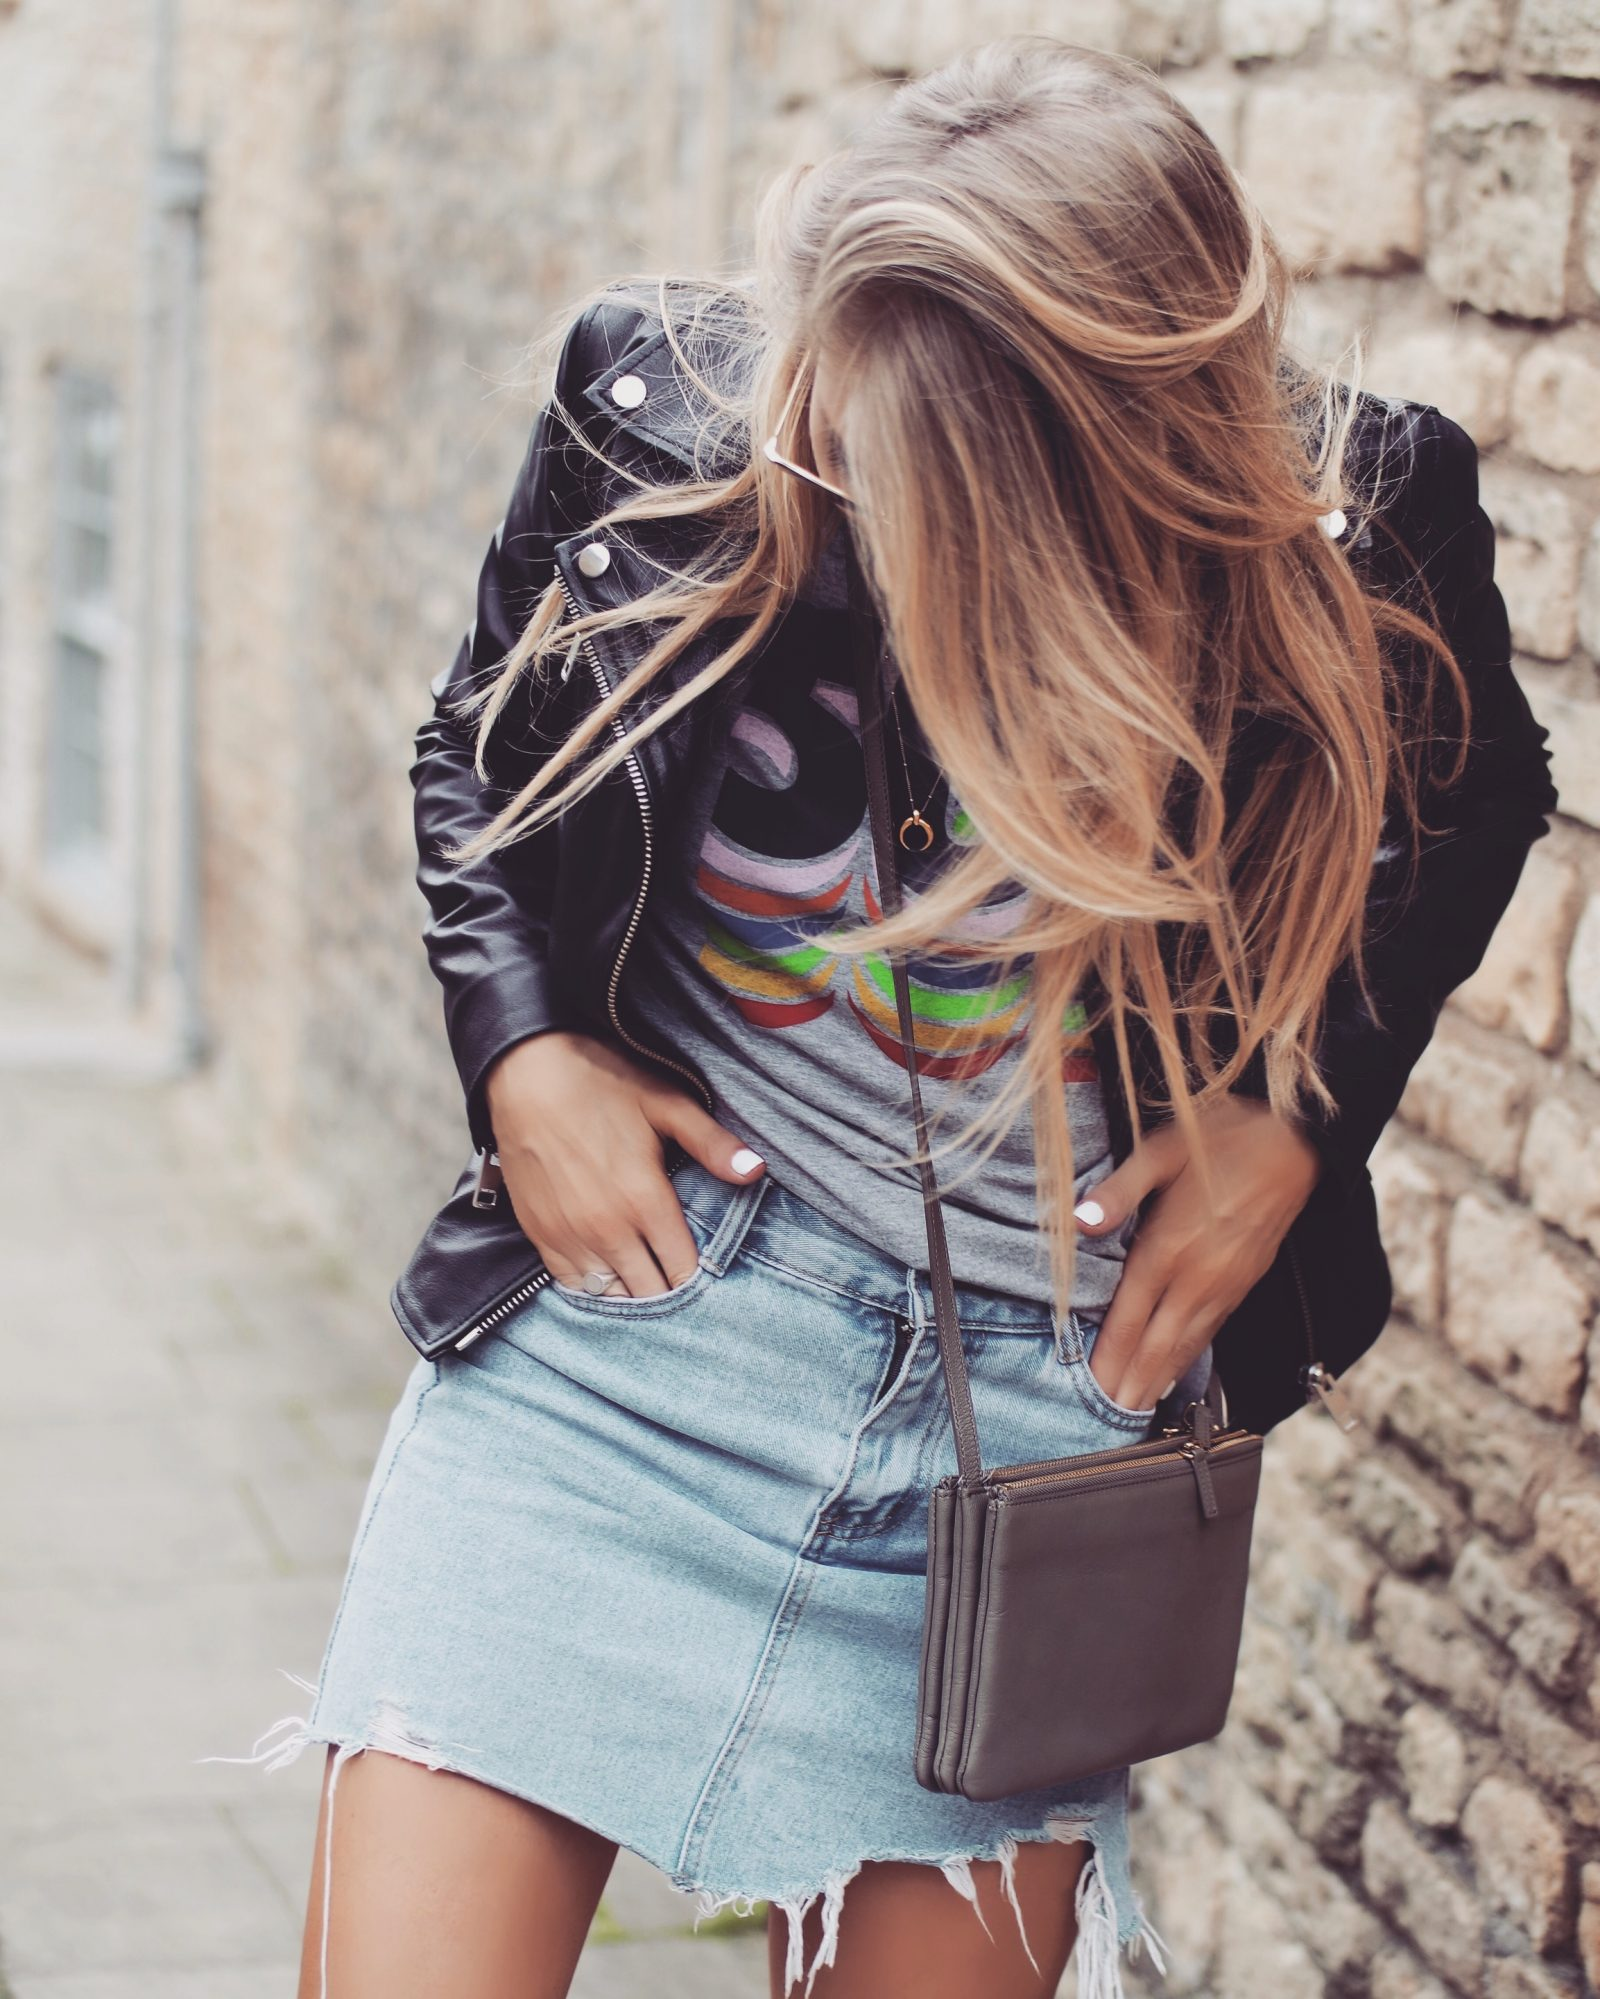 Leather Jacket - Celine Trio Khaki